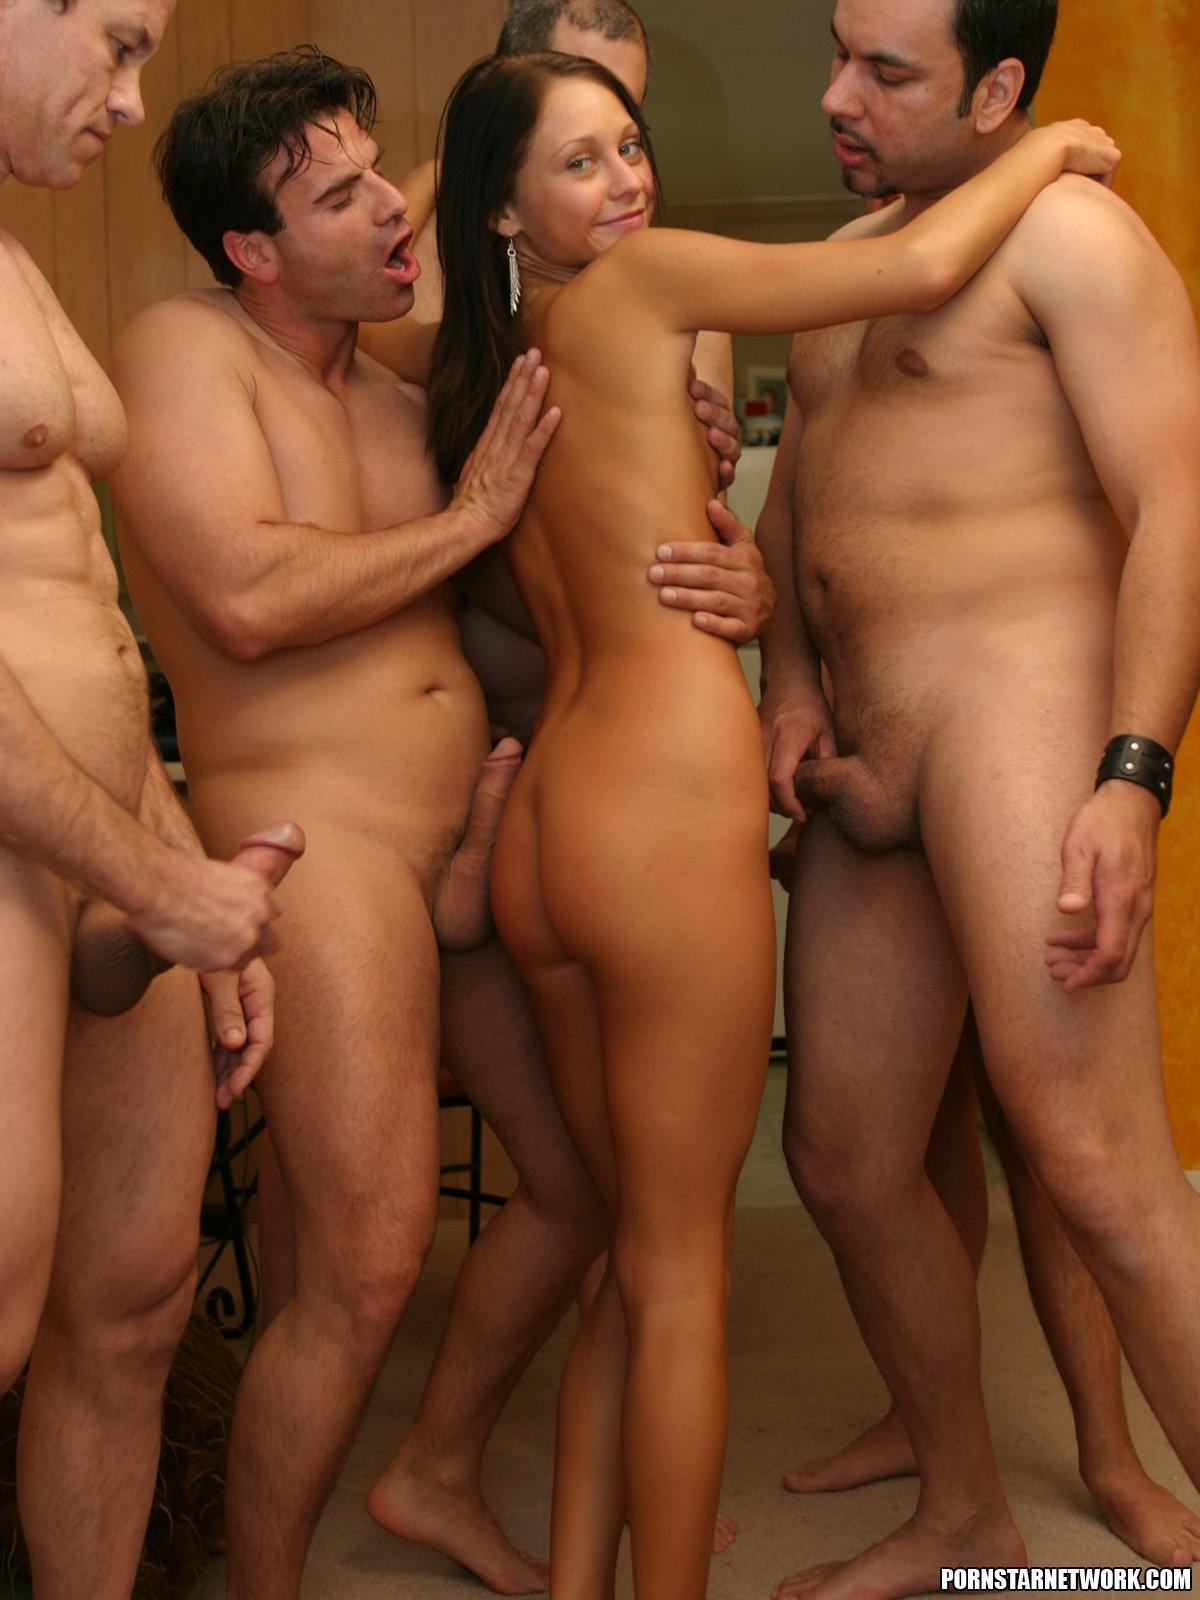 порно онлайн толпа мужиков аматор - 9